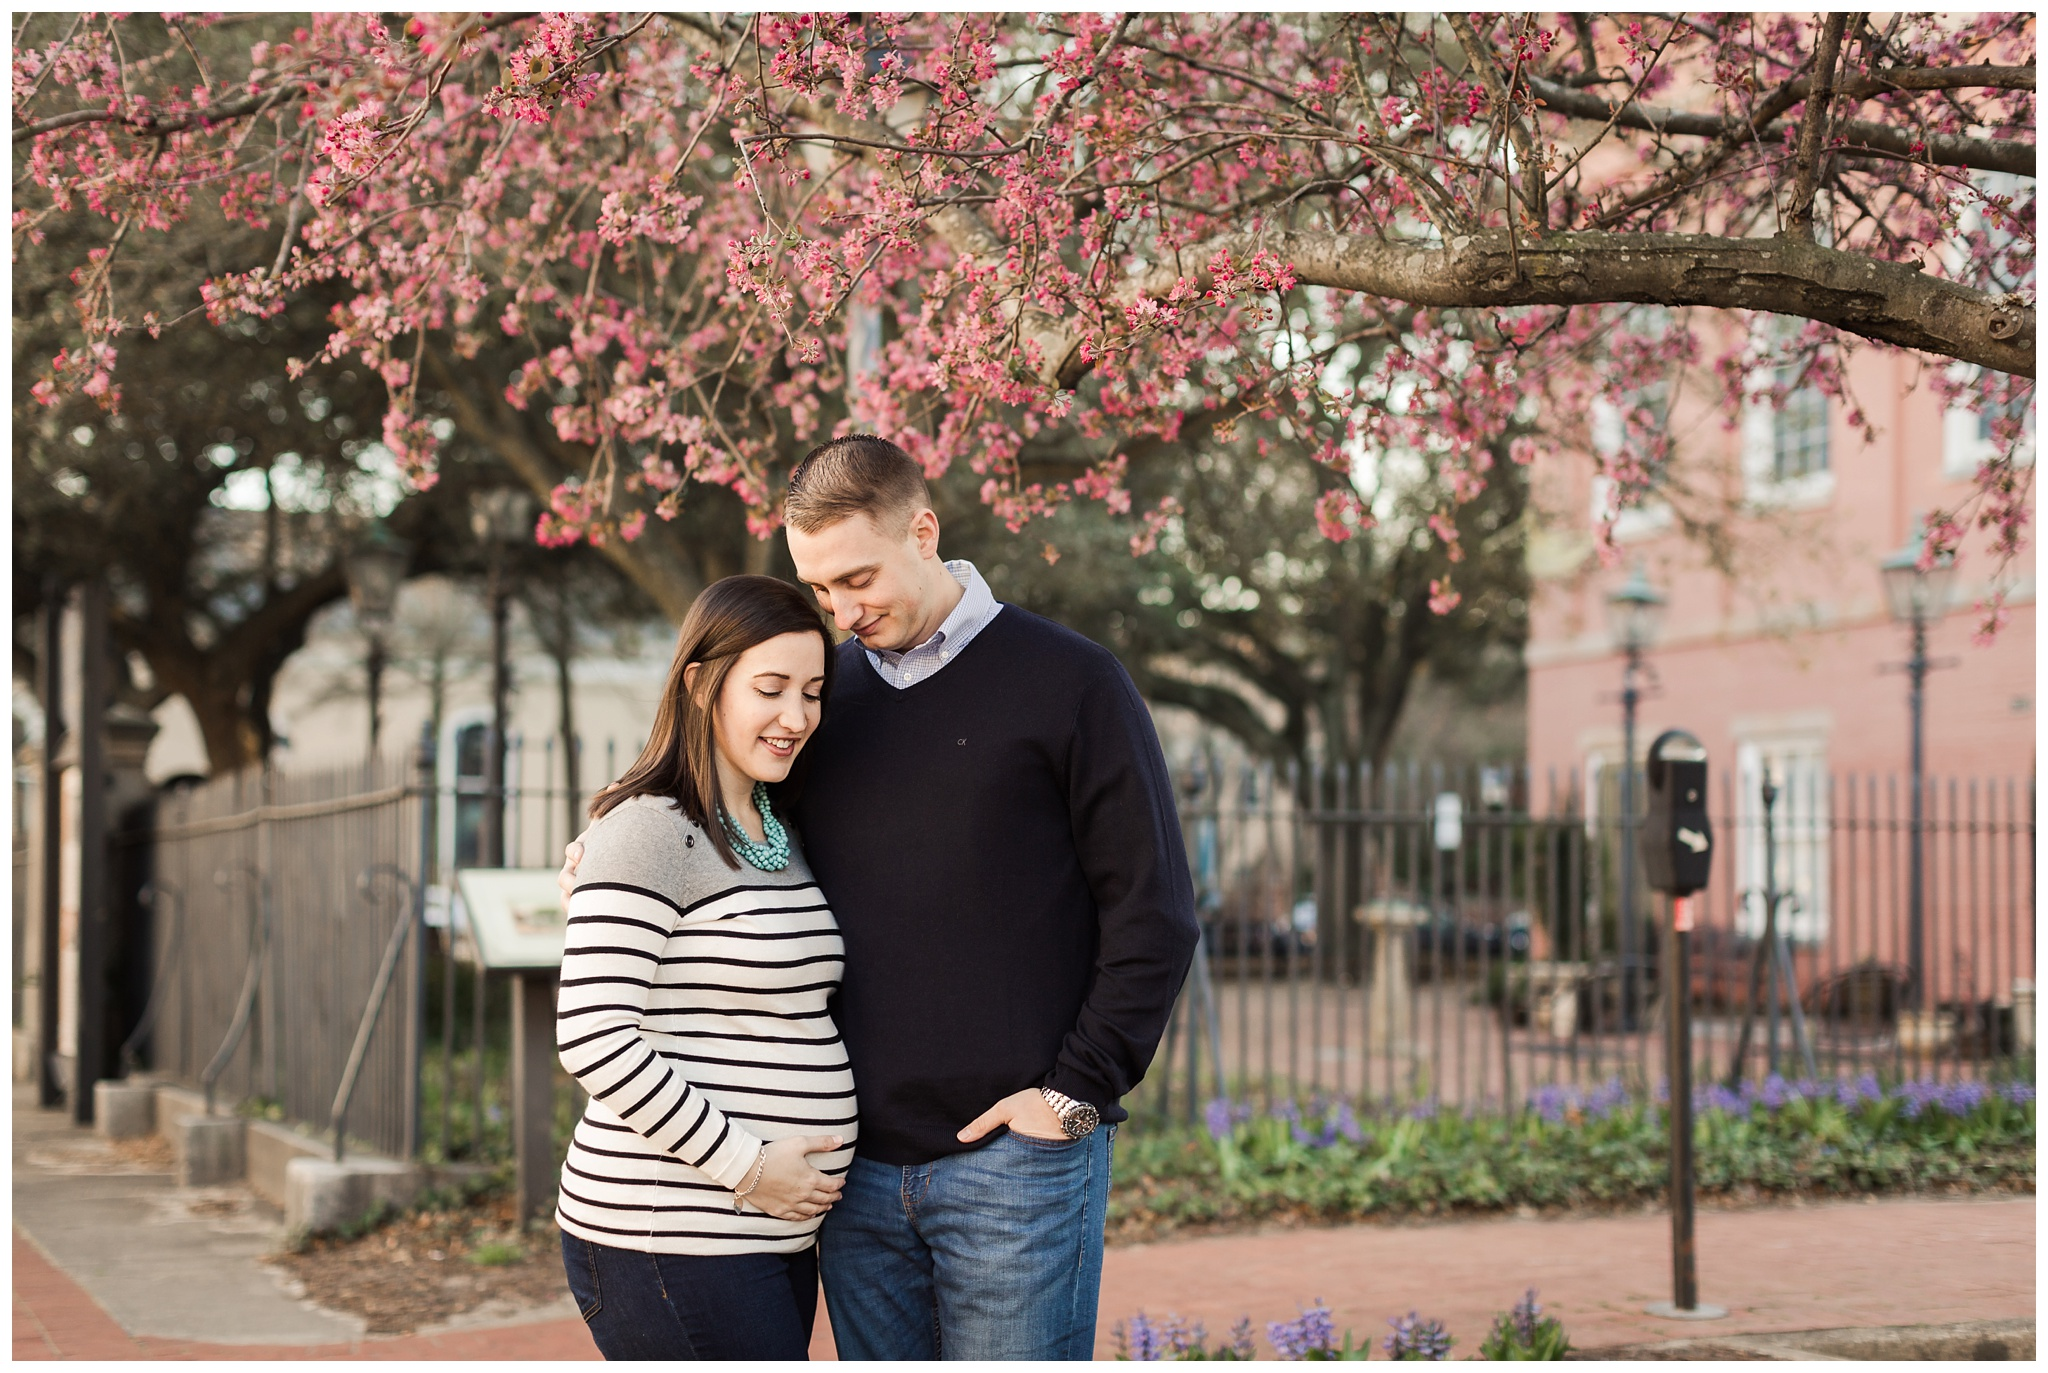 Hampton-Roads-maternity-photographer-7.jpg